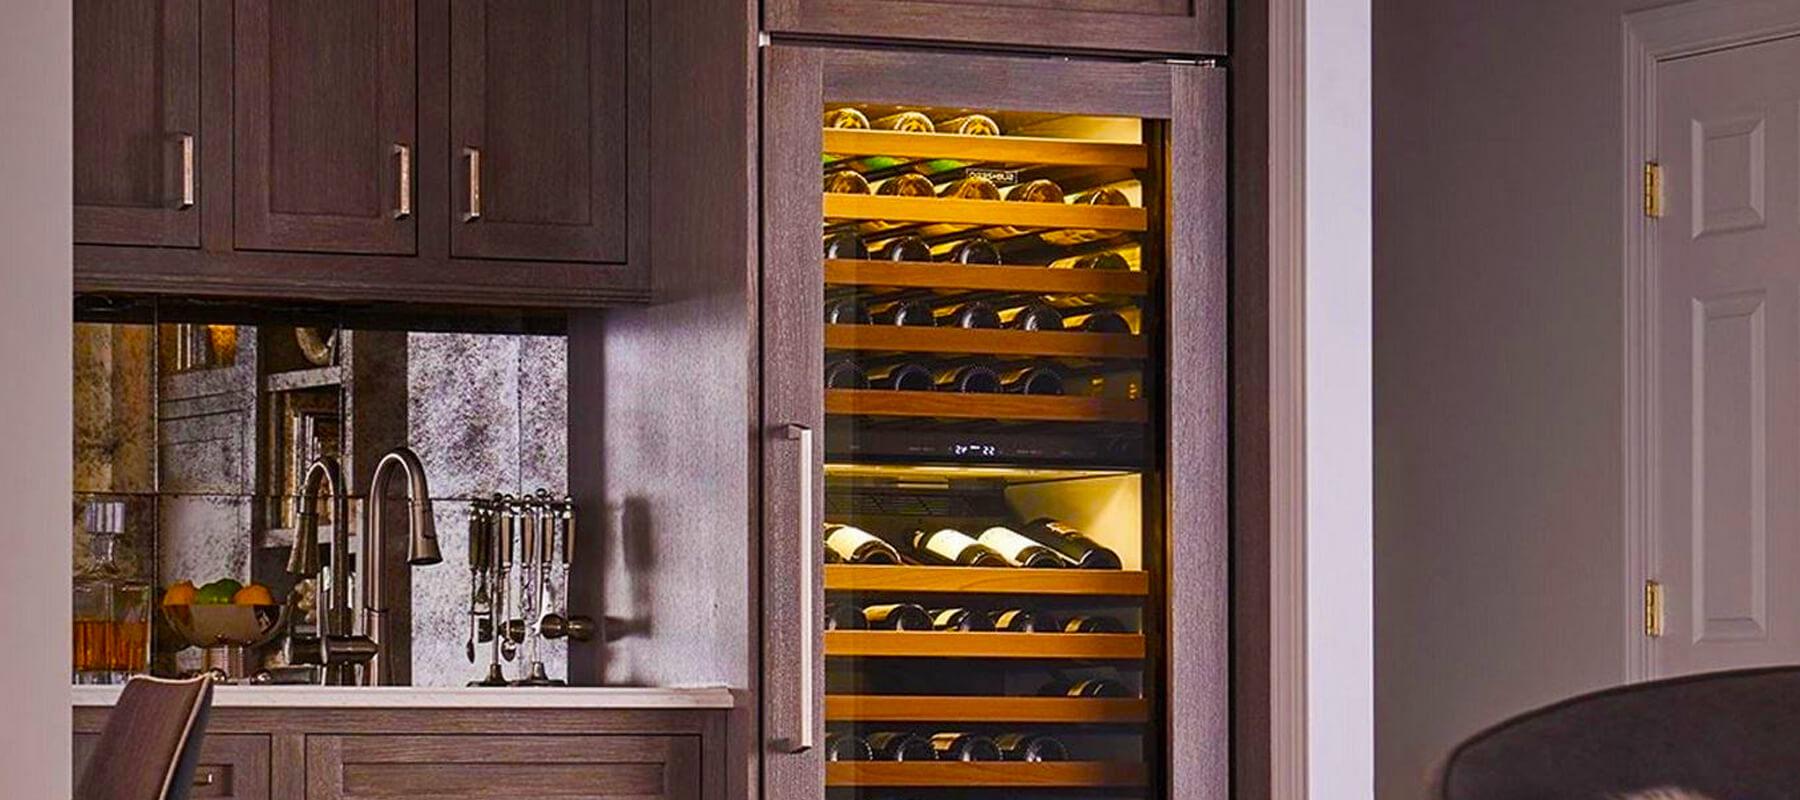 Built in Wine Refrigerator Los Angeles | Built-in Refrigerator Repair